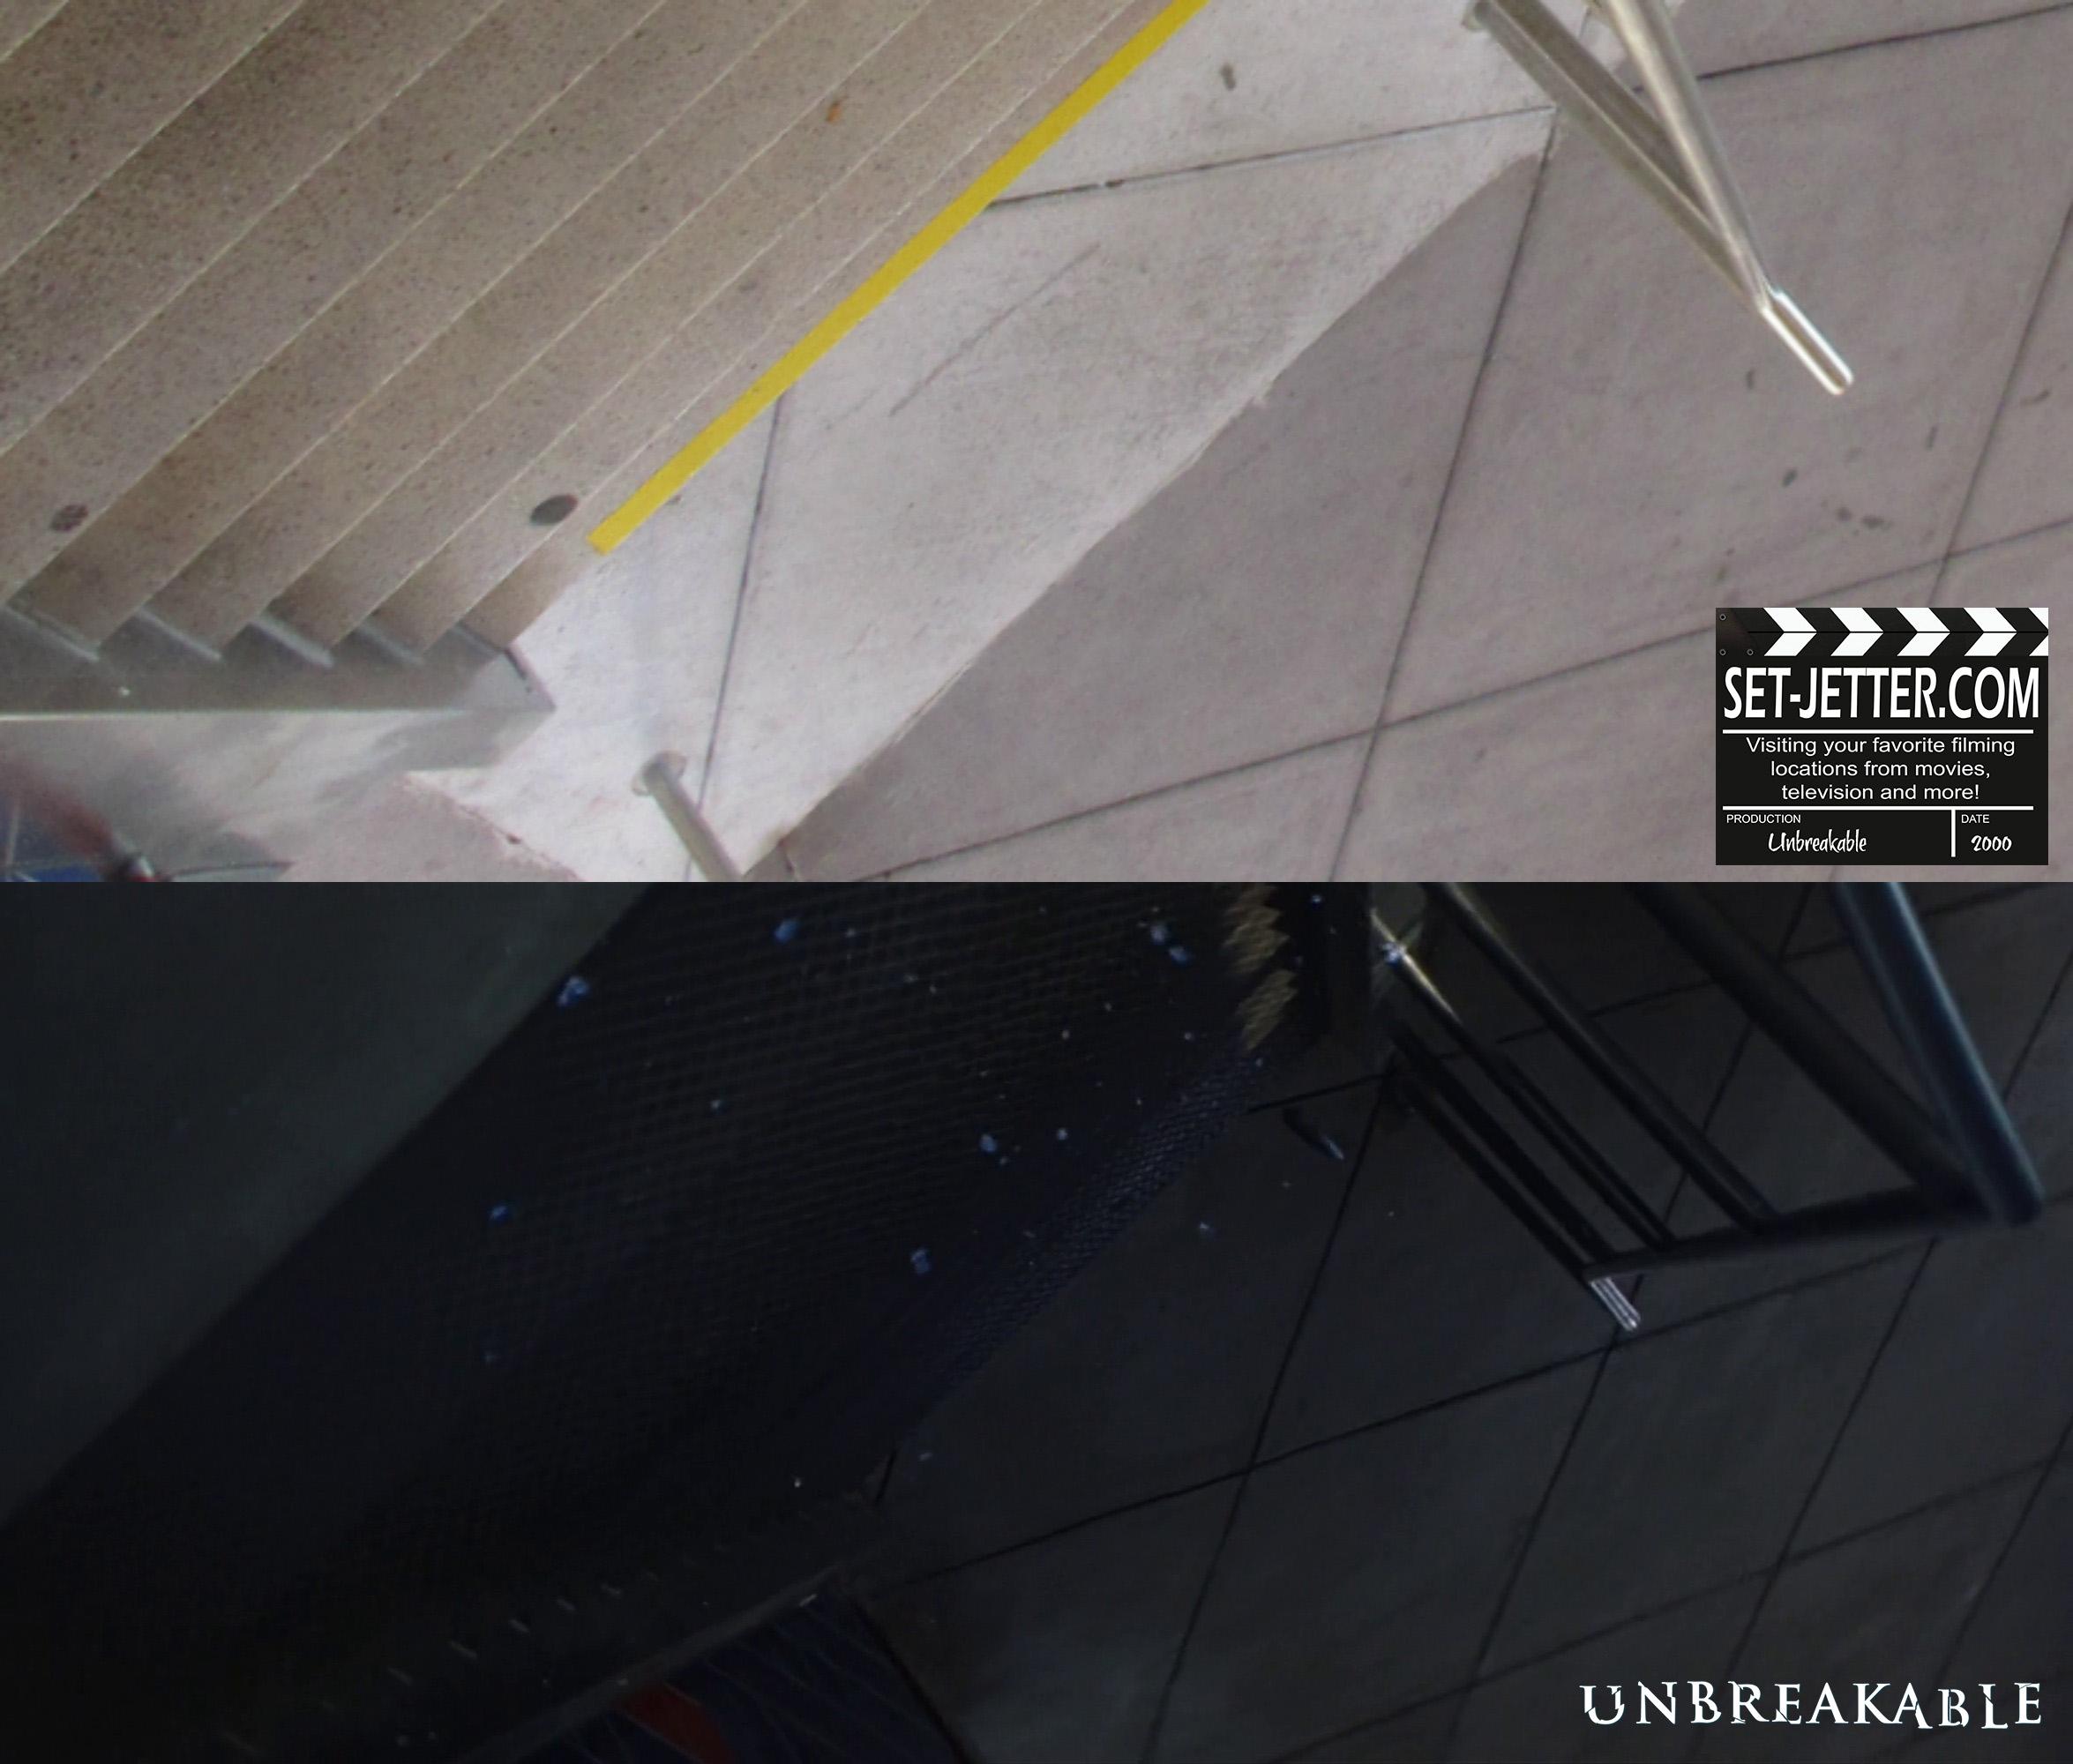 Unbreakable 086.jpg